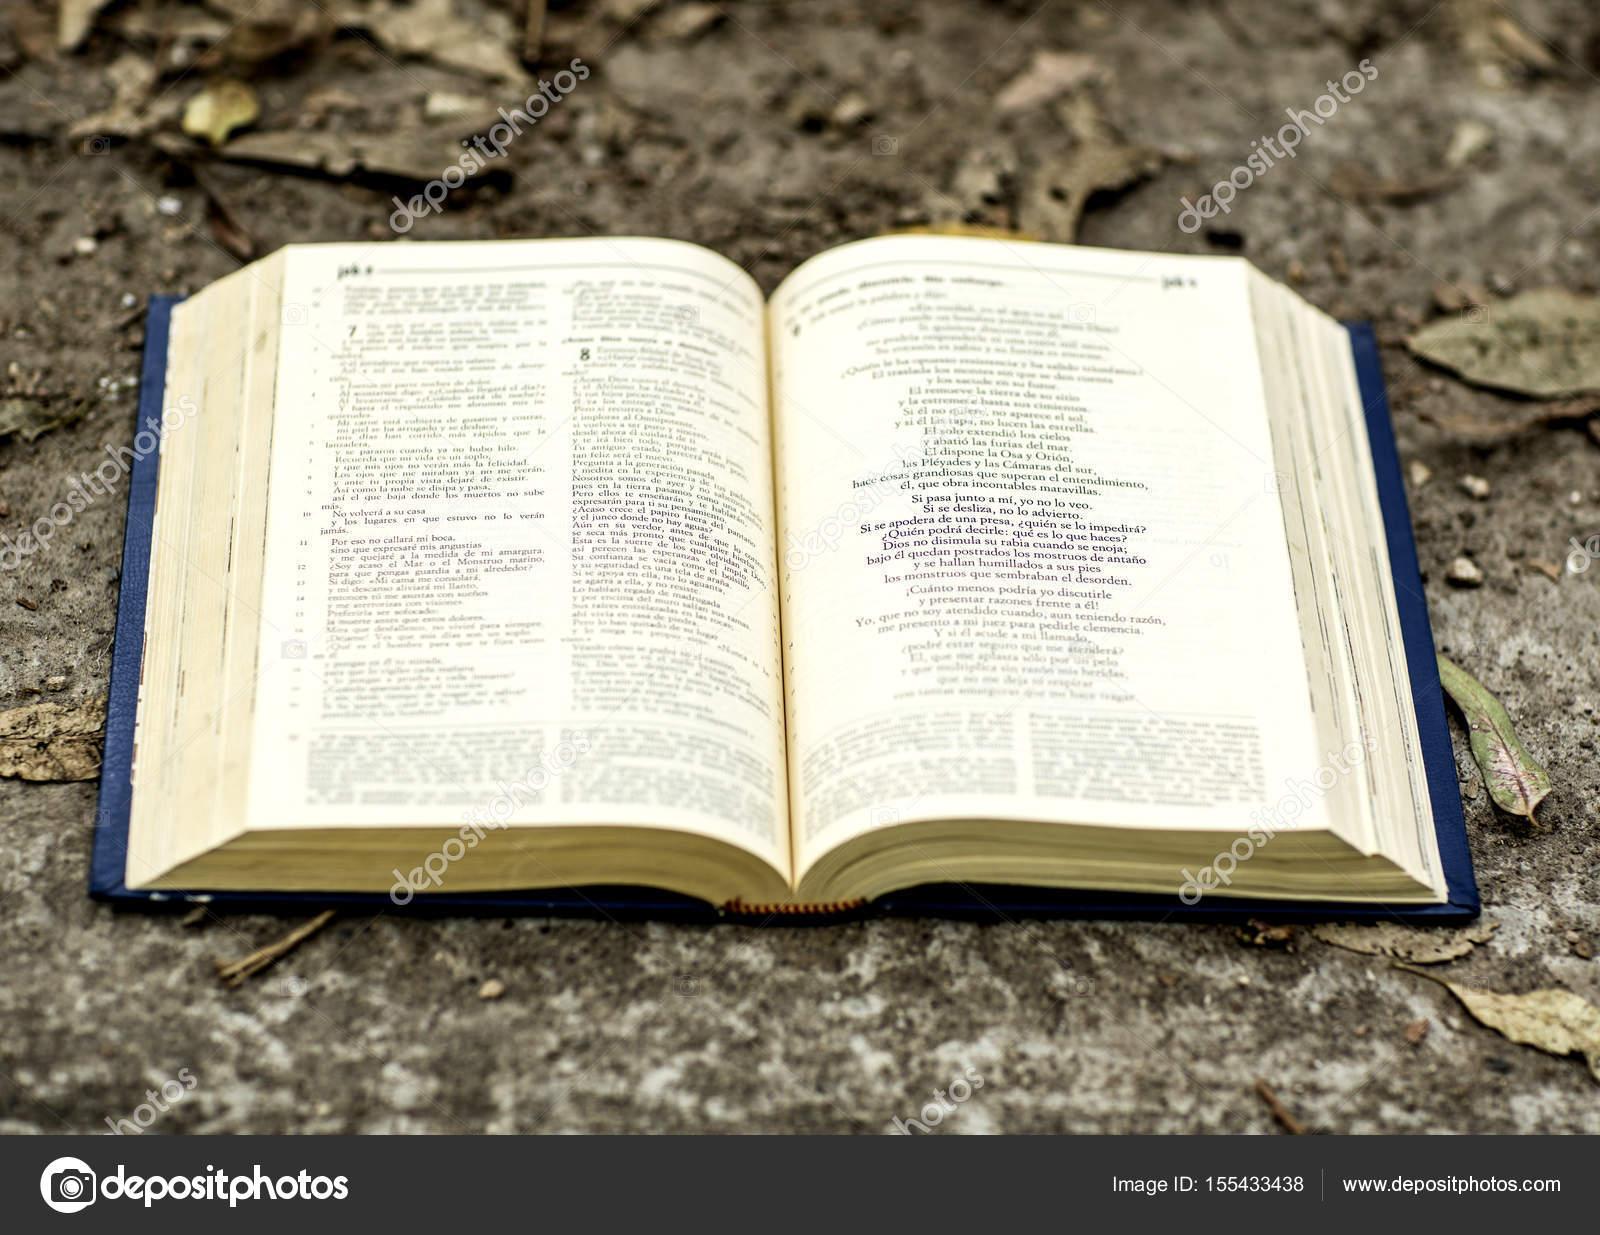 Dibujo De Biblias Abiertas Santa Biblia Abierta Foto De Stock